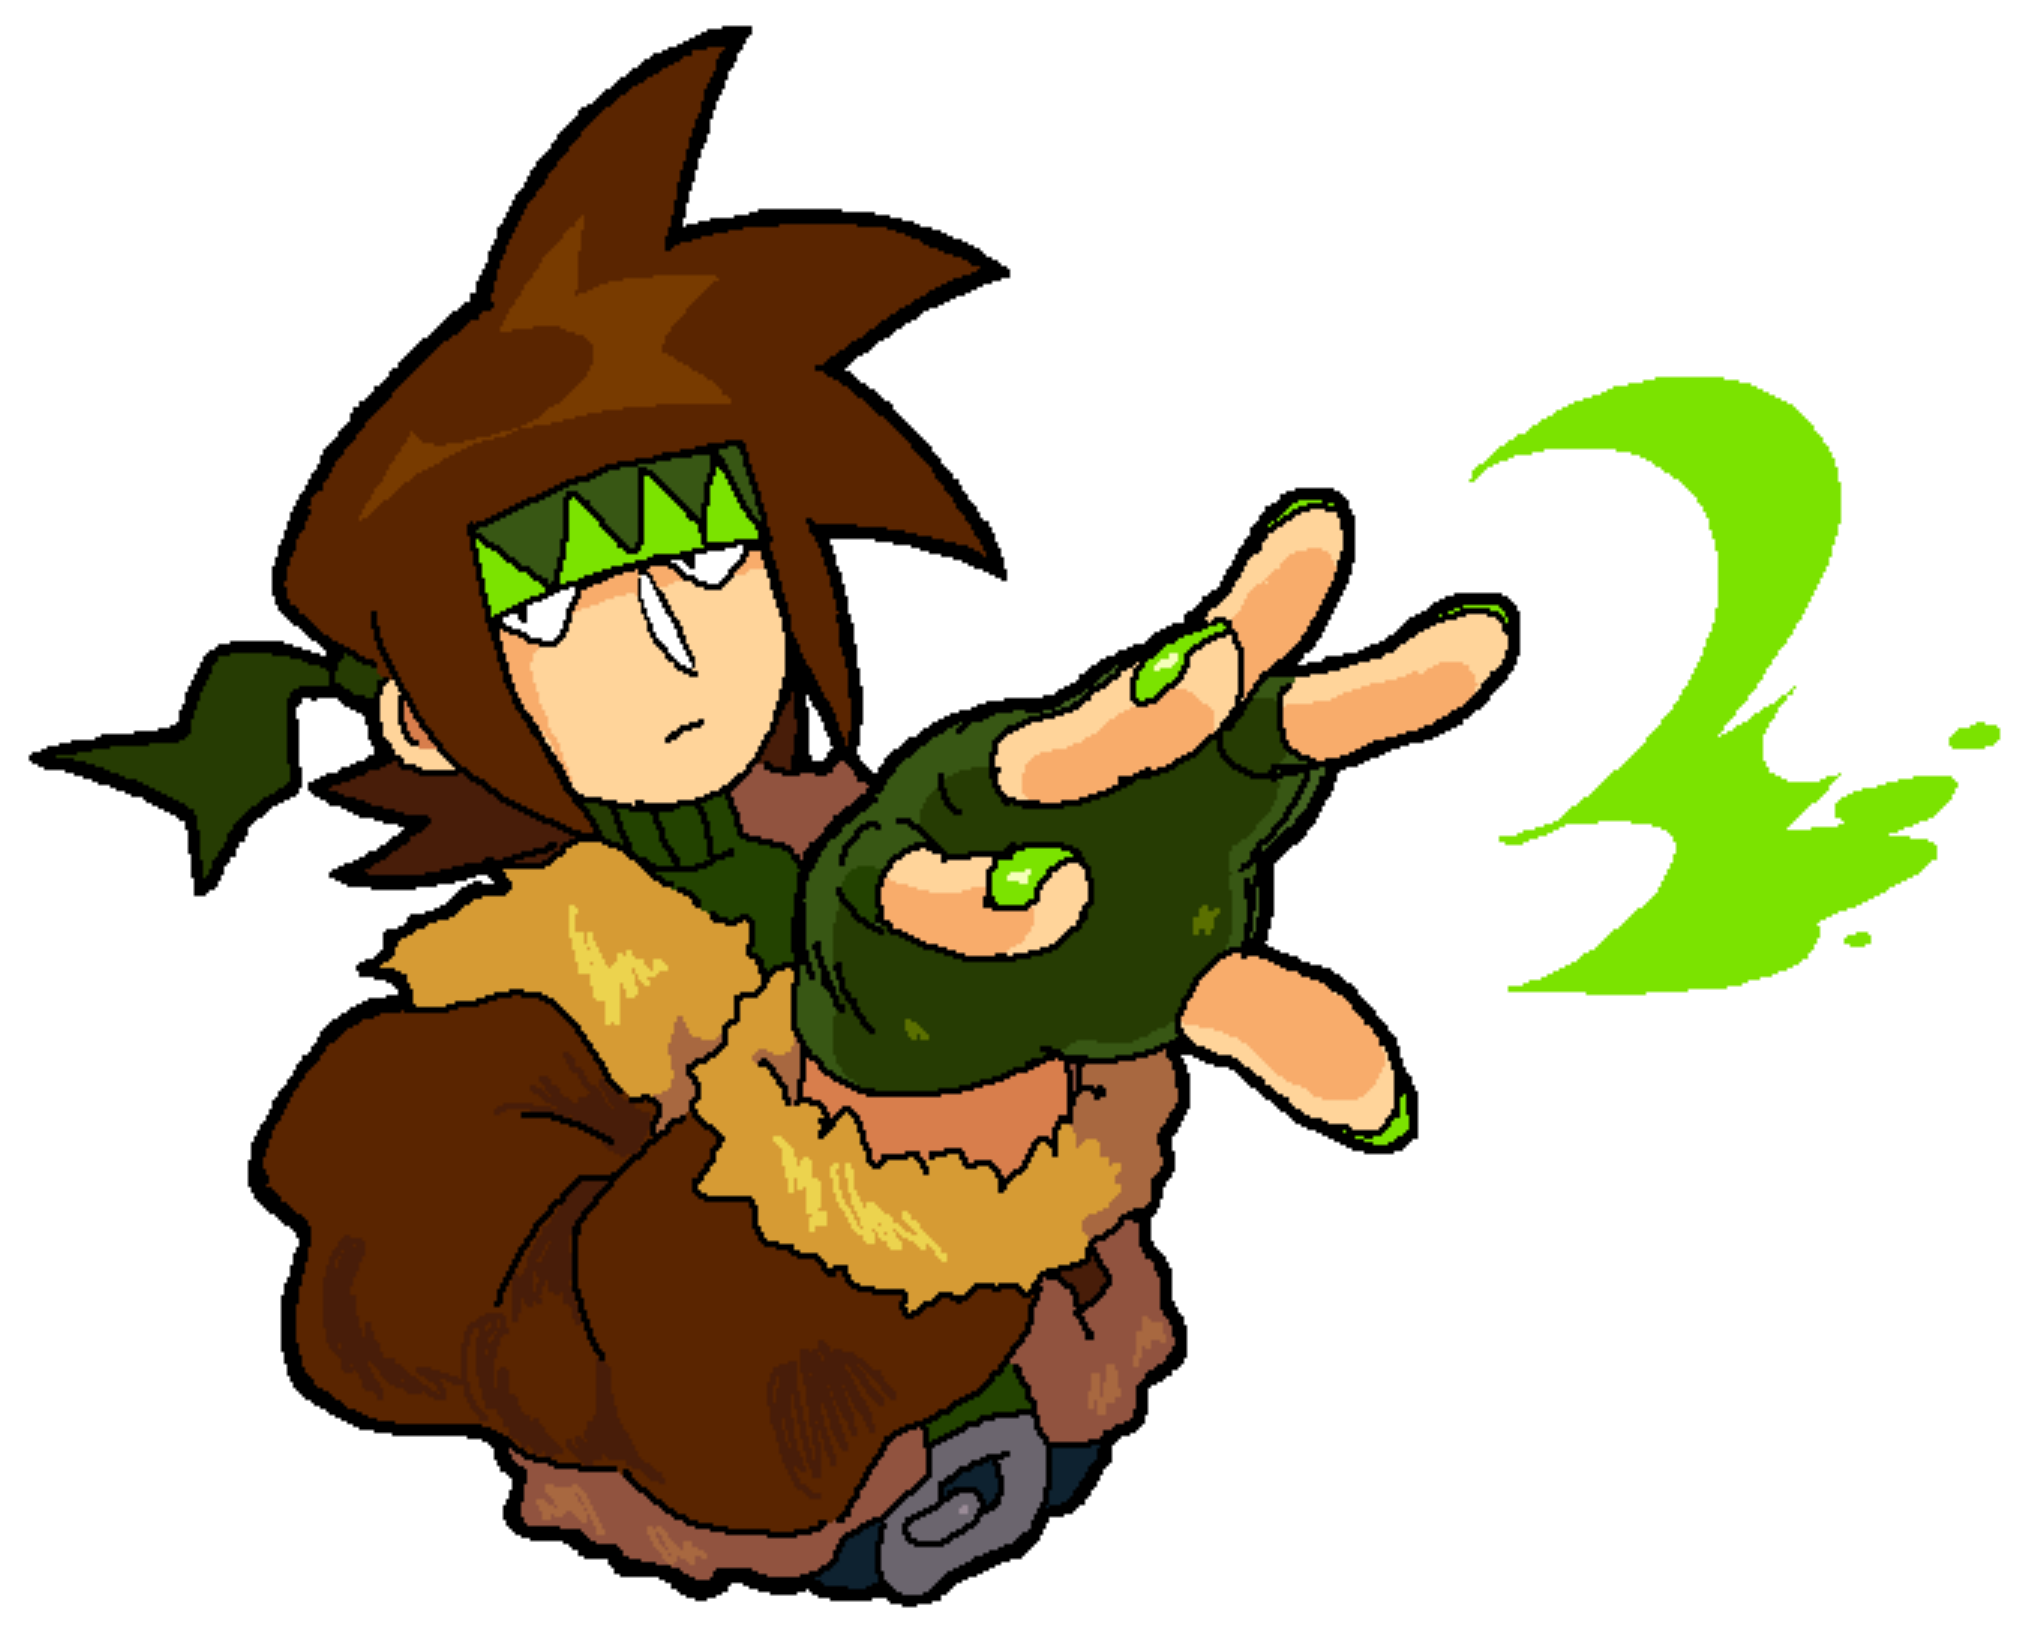 greenm